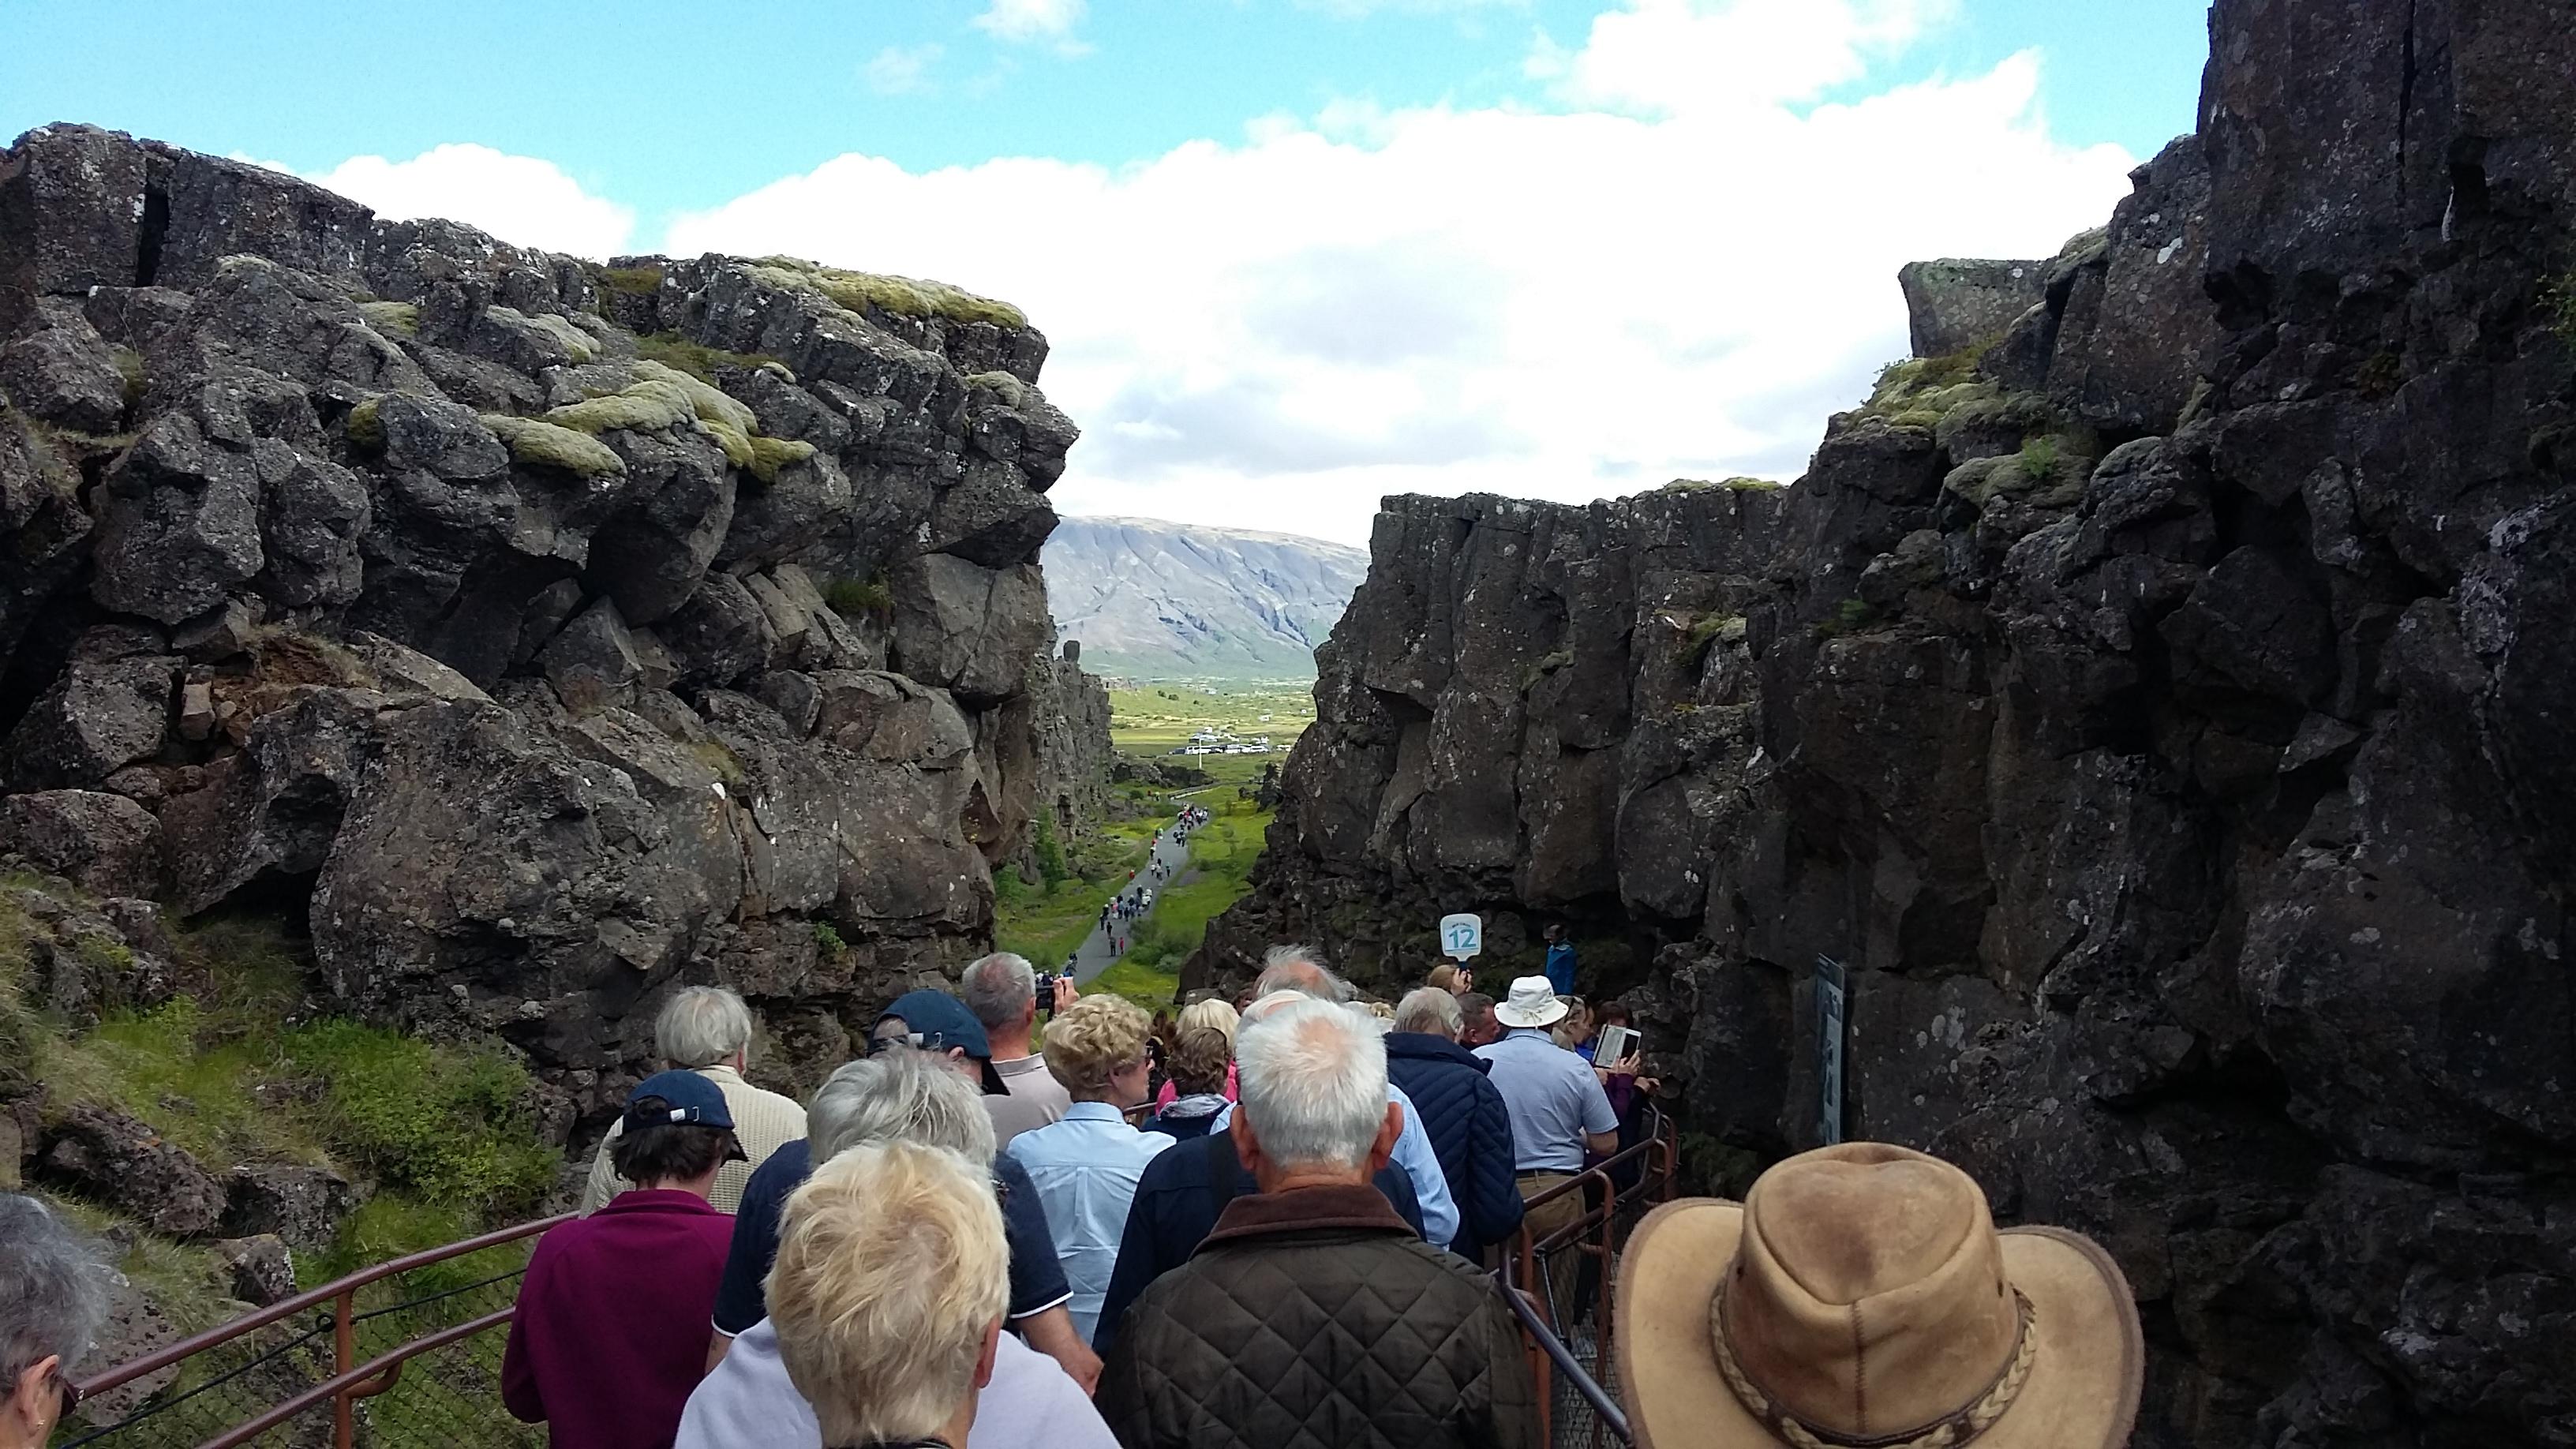 Tectonic Plates Separating